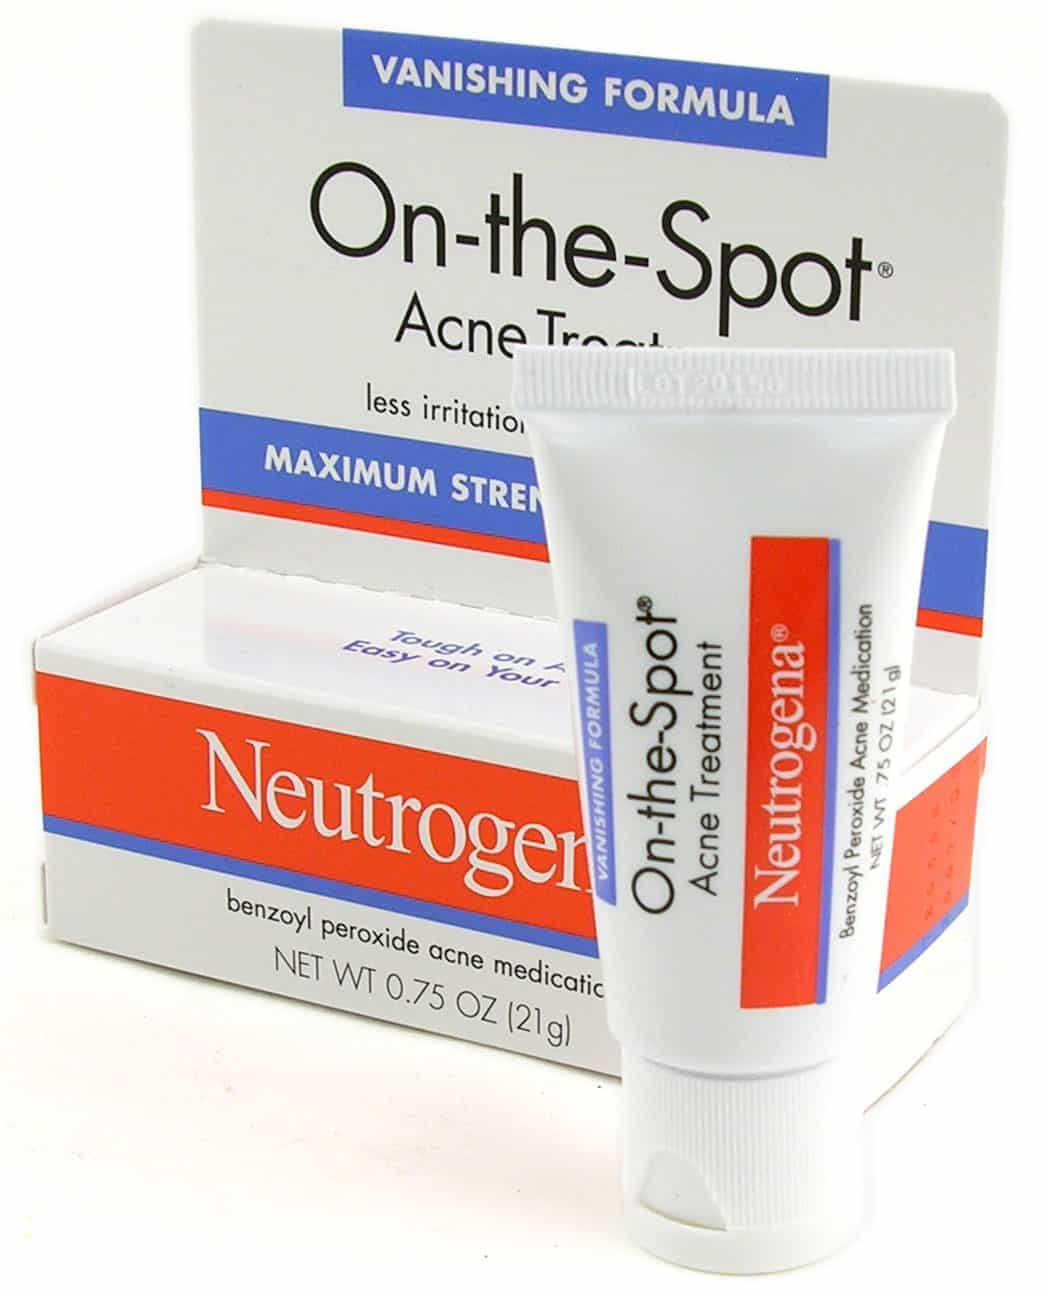 neutrogena-on-the-spot